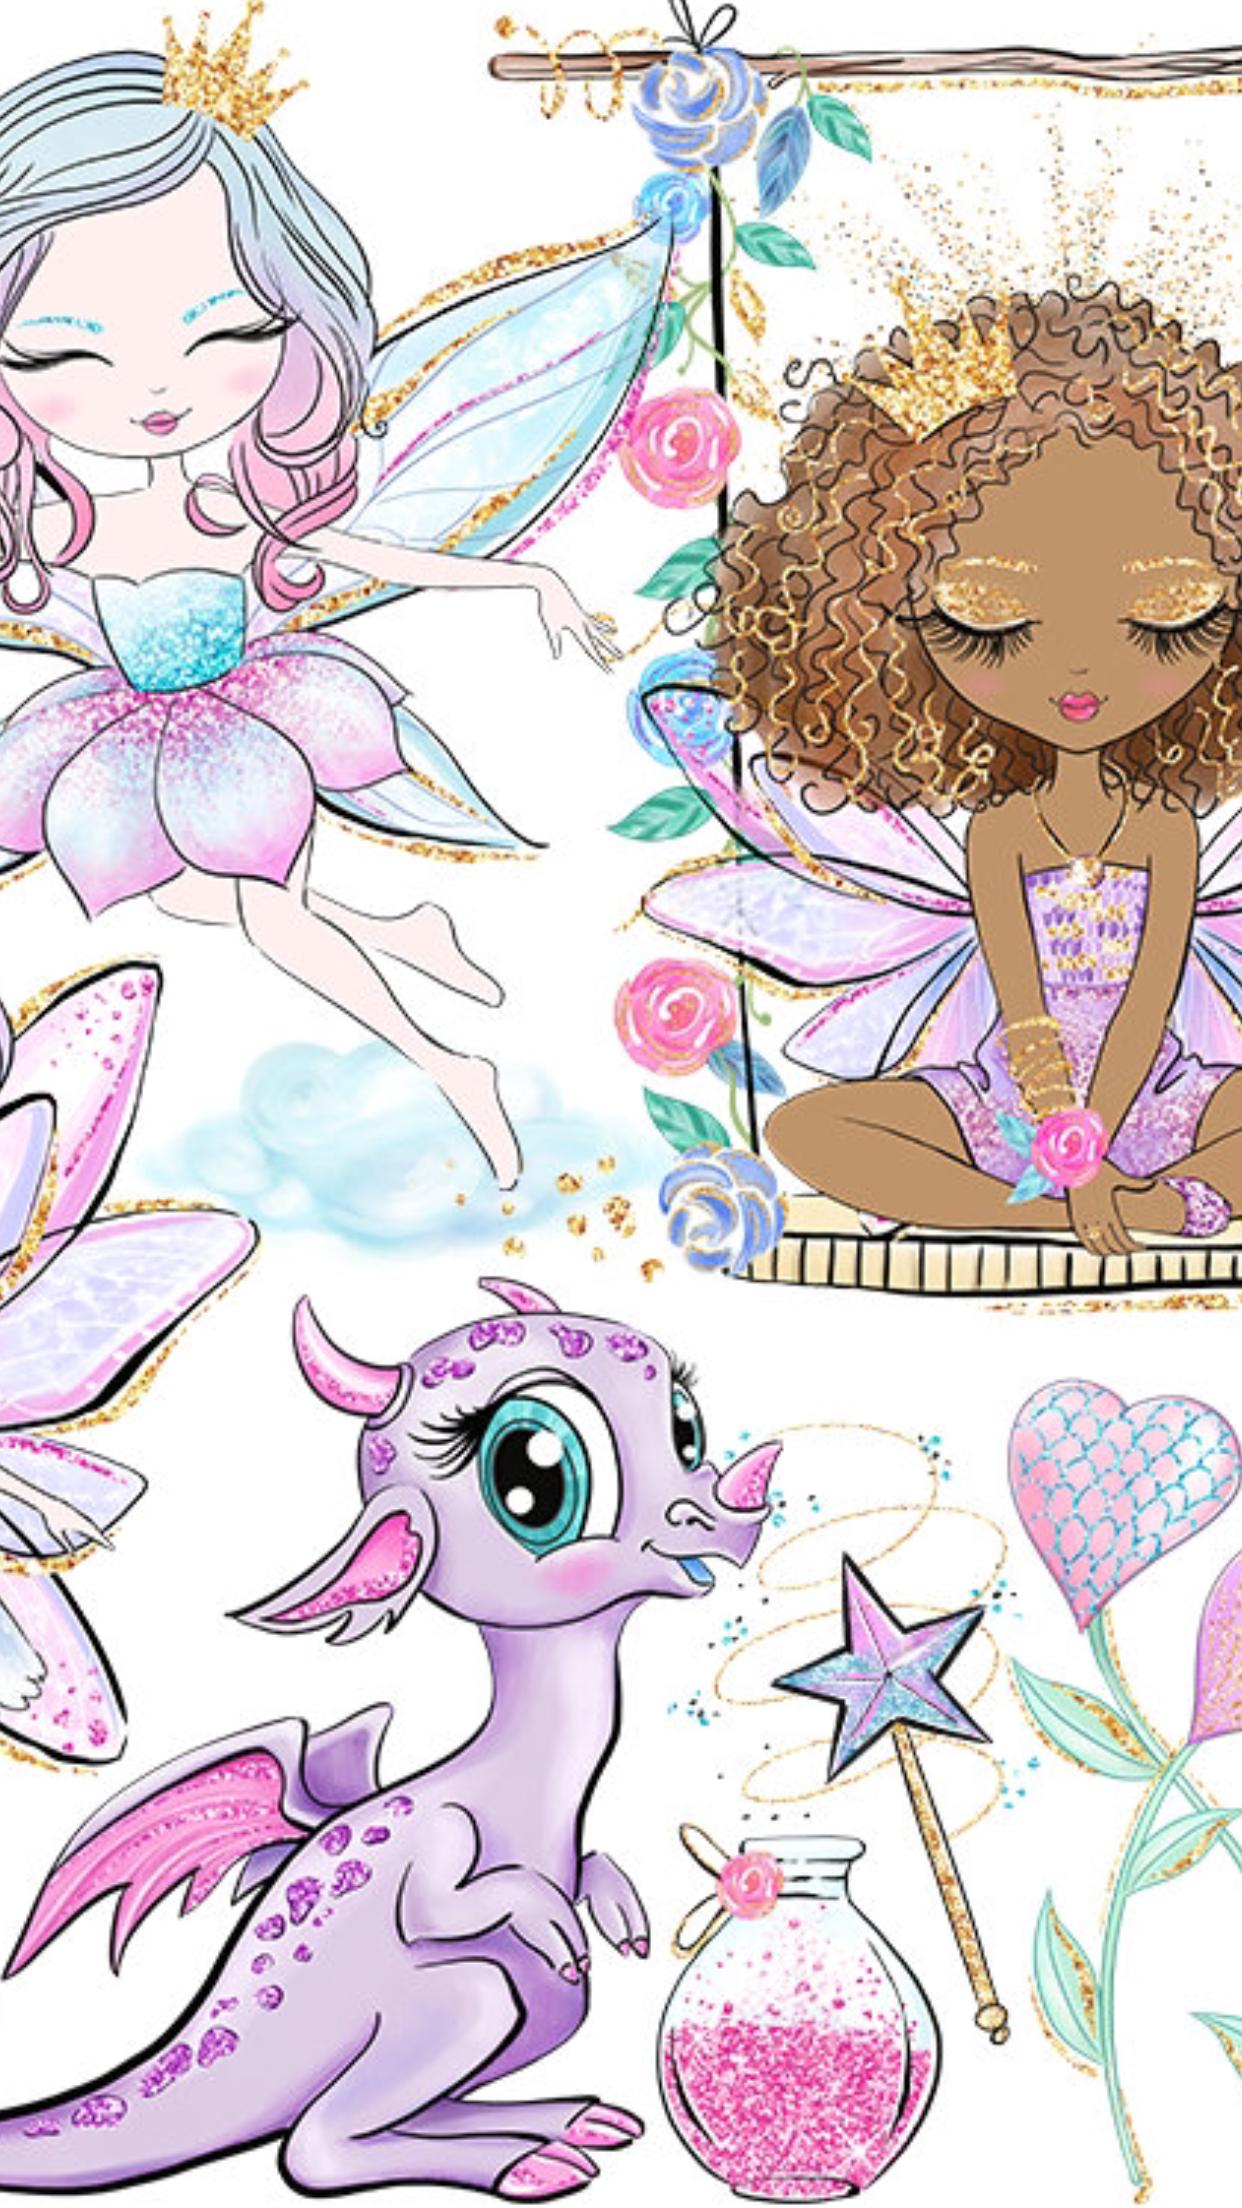 ᎥᏢhσnє Ꮃαllpαpєrѕ Fairy wallpaper, Cute wallpapers